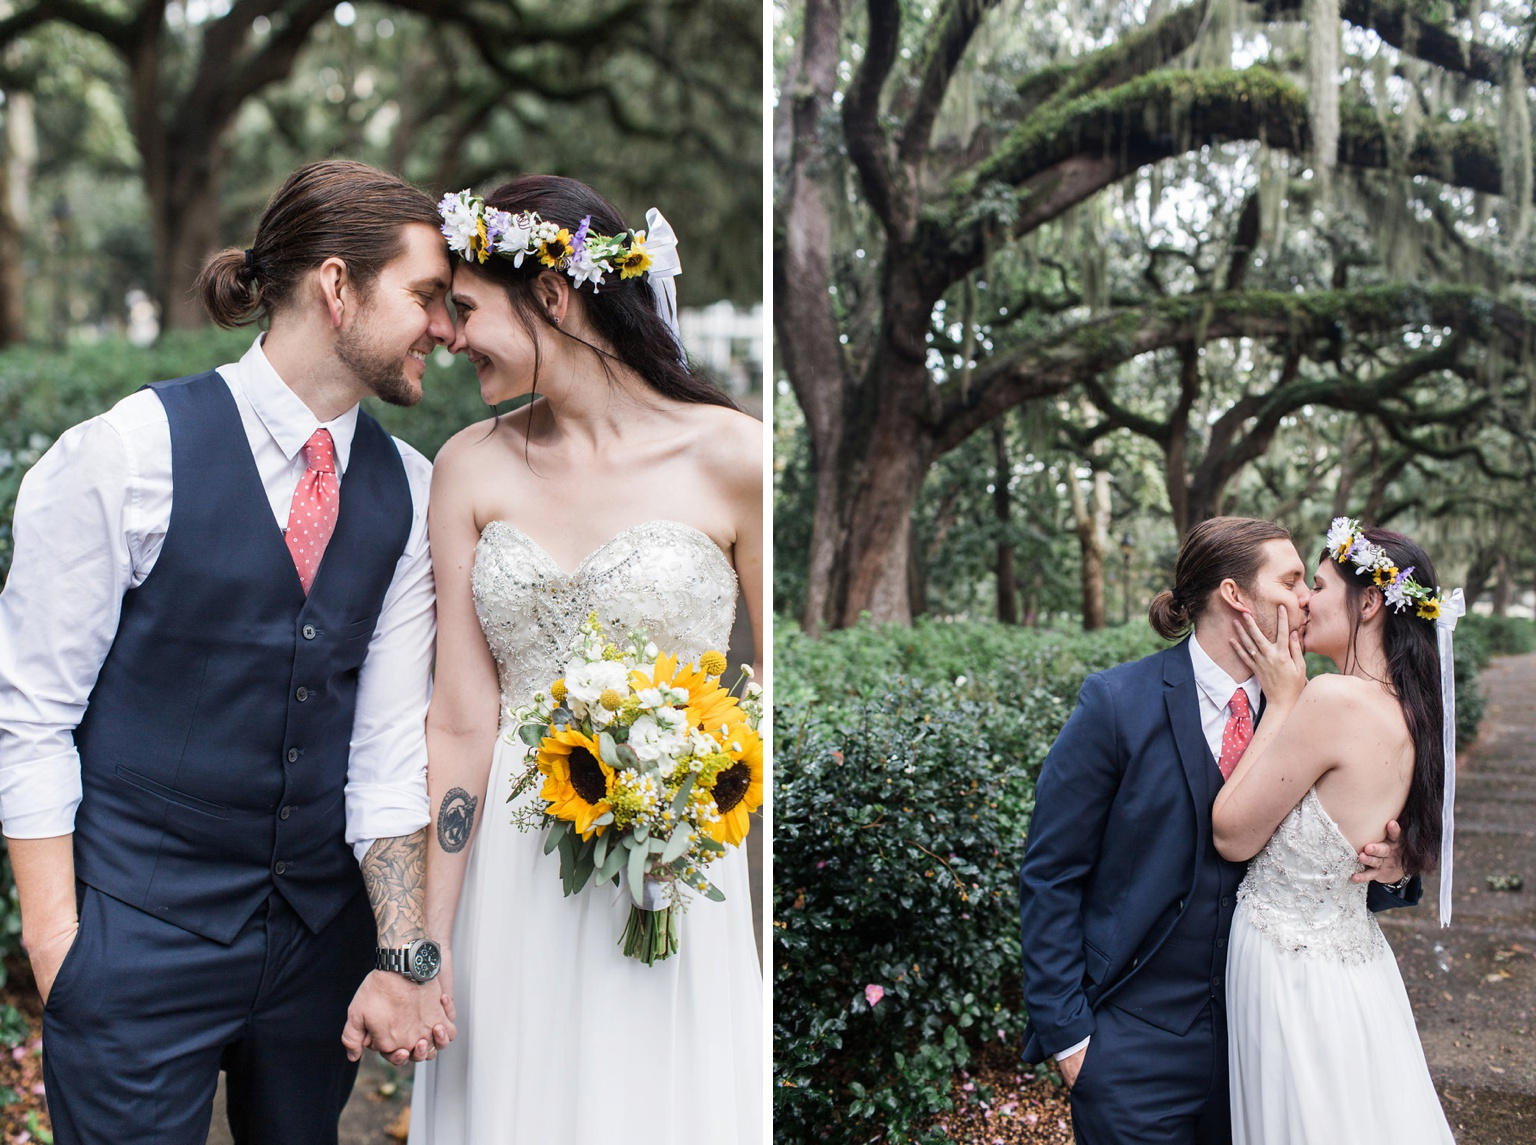 Apt_B_Photo_Savannah_Wedding_Photographer_Flower_Crown063.JPG